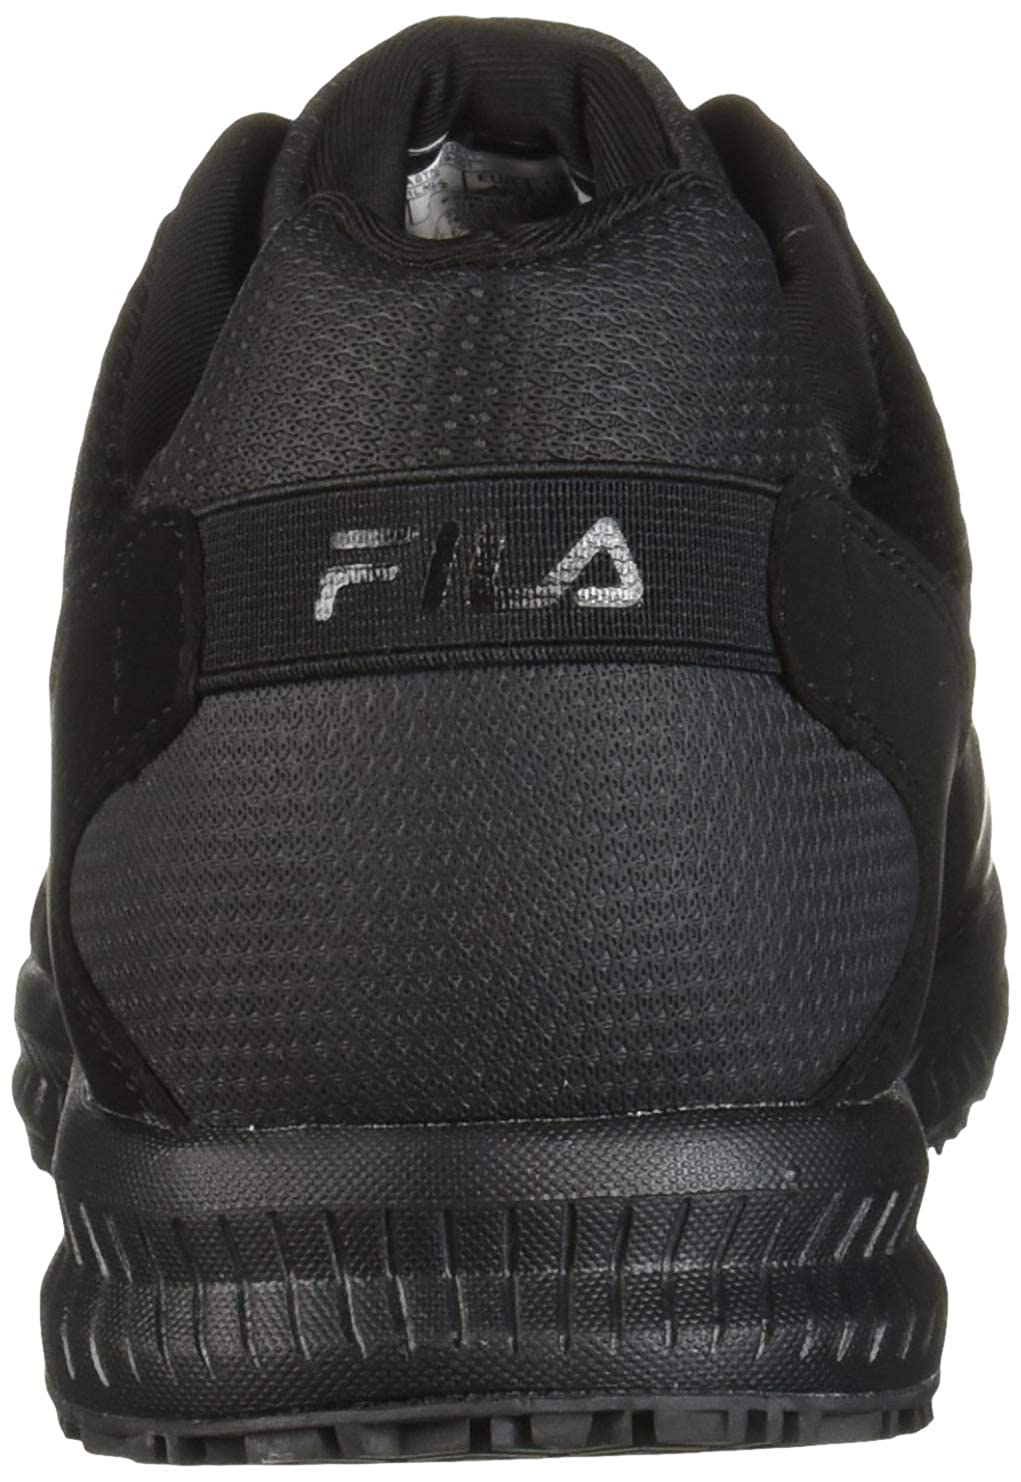 44d68f5c Fila Men's Memory Layers Slip Resistant Work Shoe Food Service